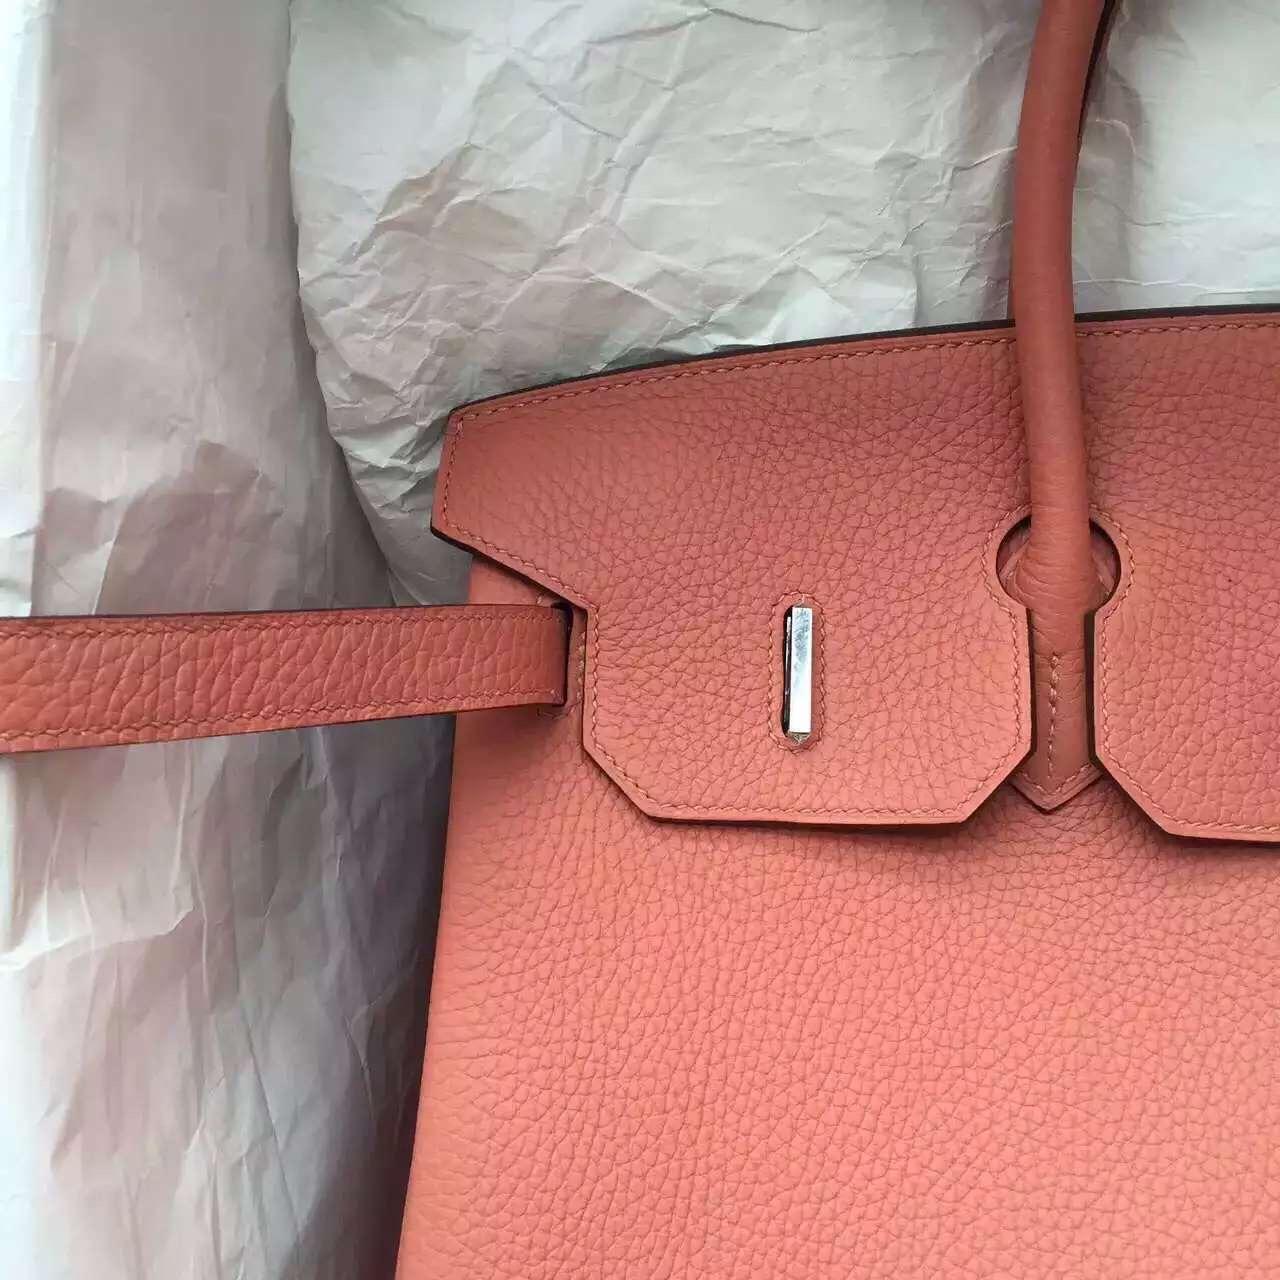 Cheap Hermes 3L Rose Tea Togo Calfskin Leather Birkin Bag 35CM Elegant Ladies' Handbag